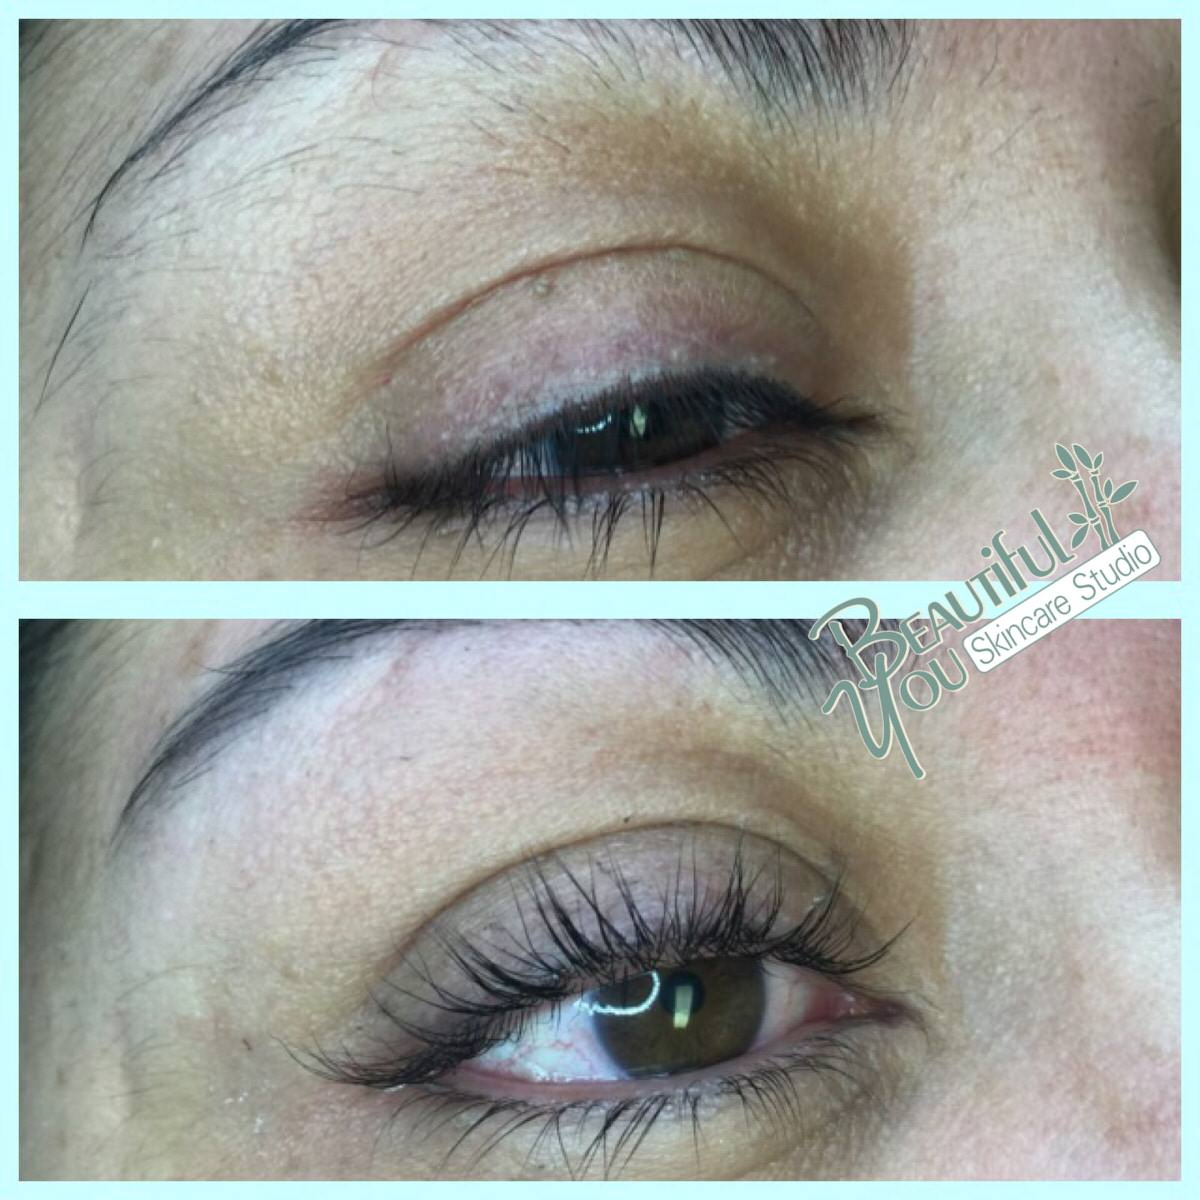 Beautiful-You-Skincare-Studio-Lash-Before-and-After3b.jpg